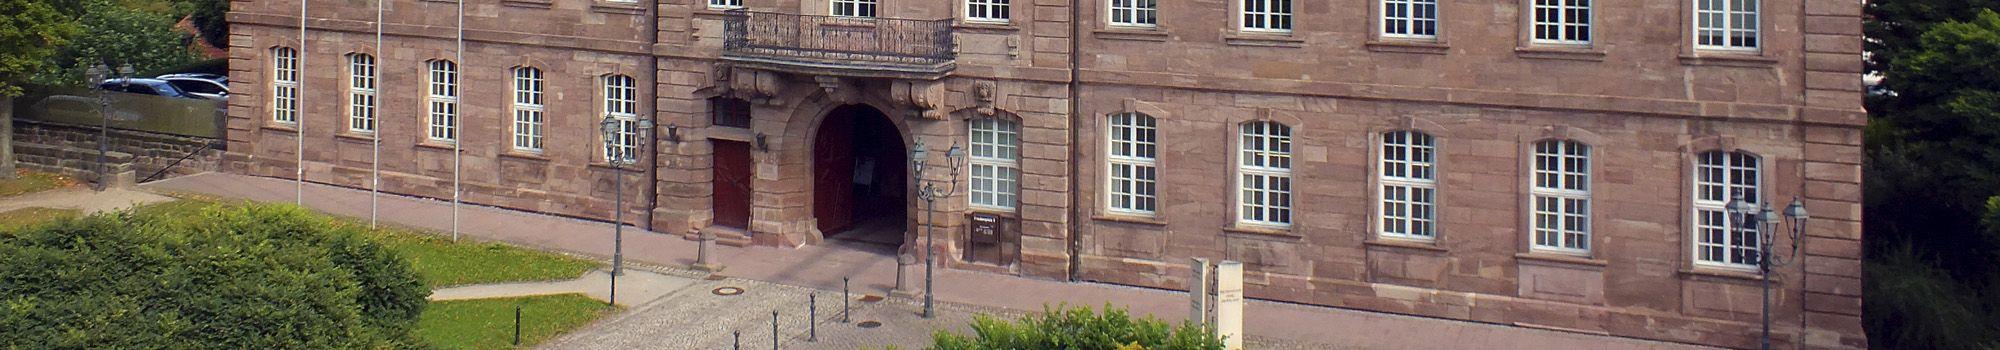 Referenzbericht Landkreis Eichsfeld